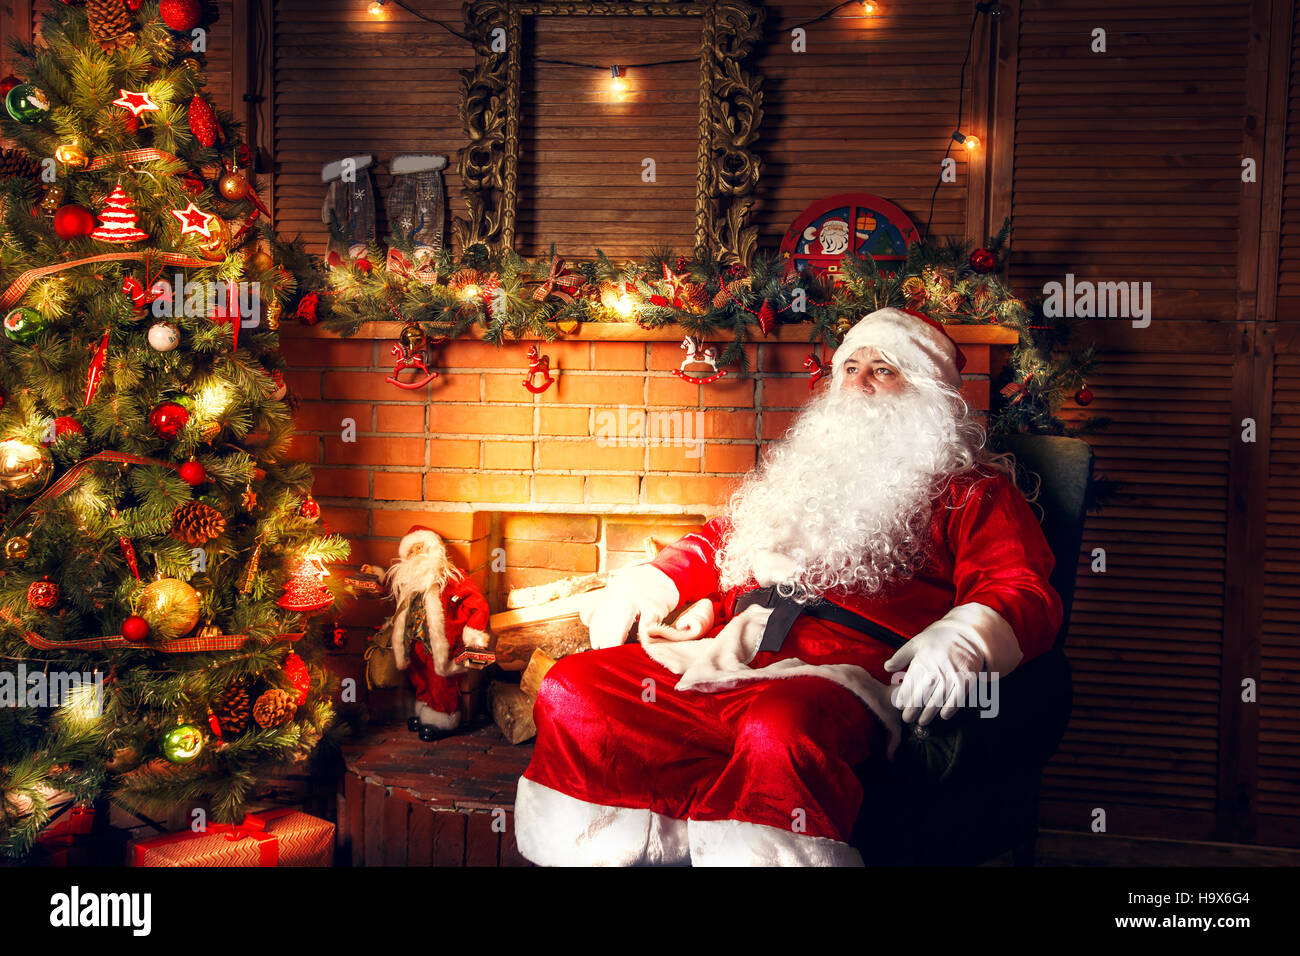 Where To Buy A Real Christmas Tree